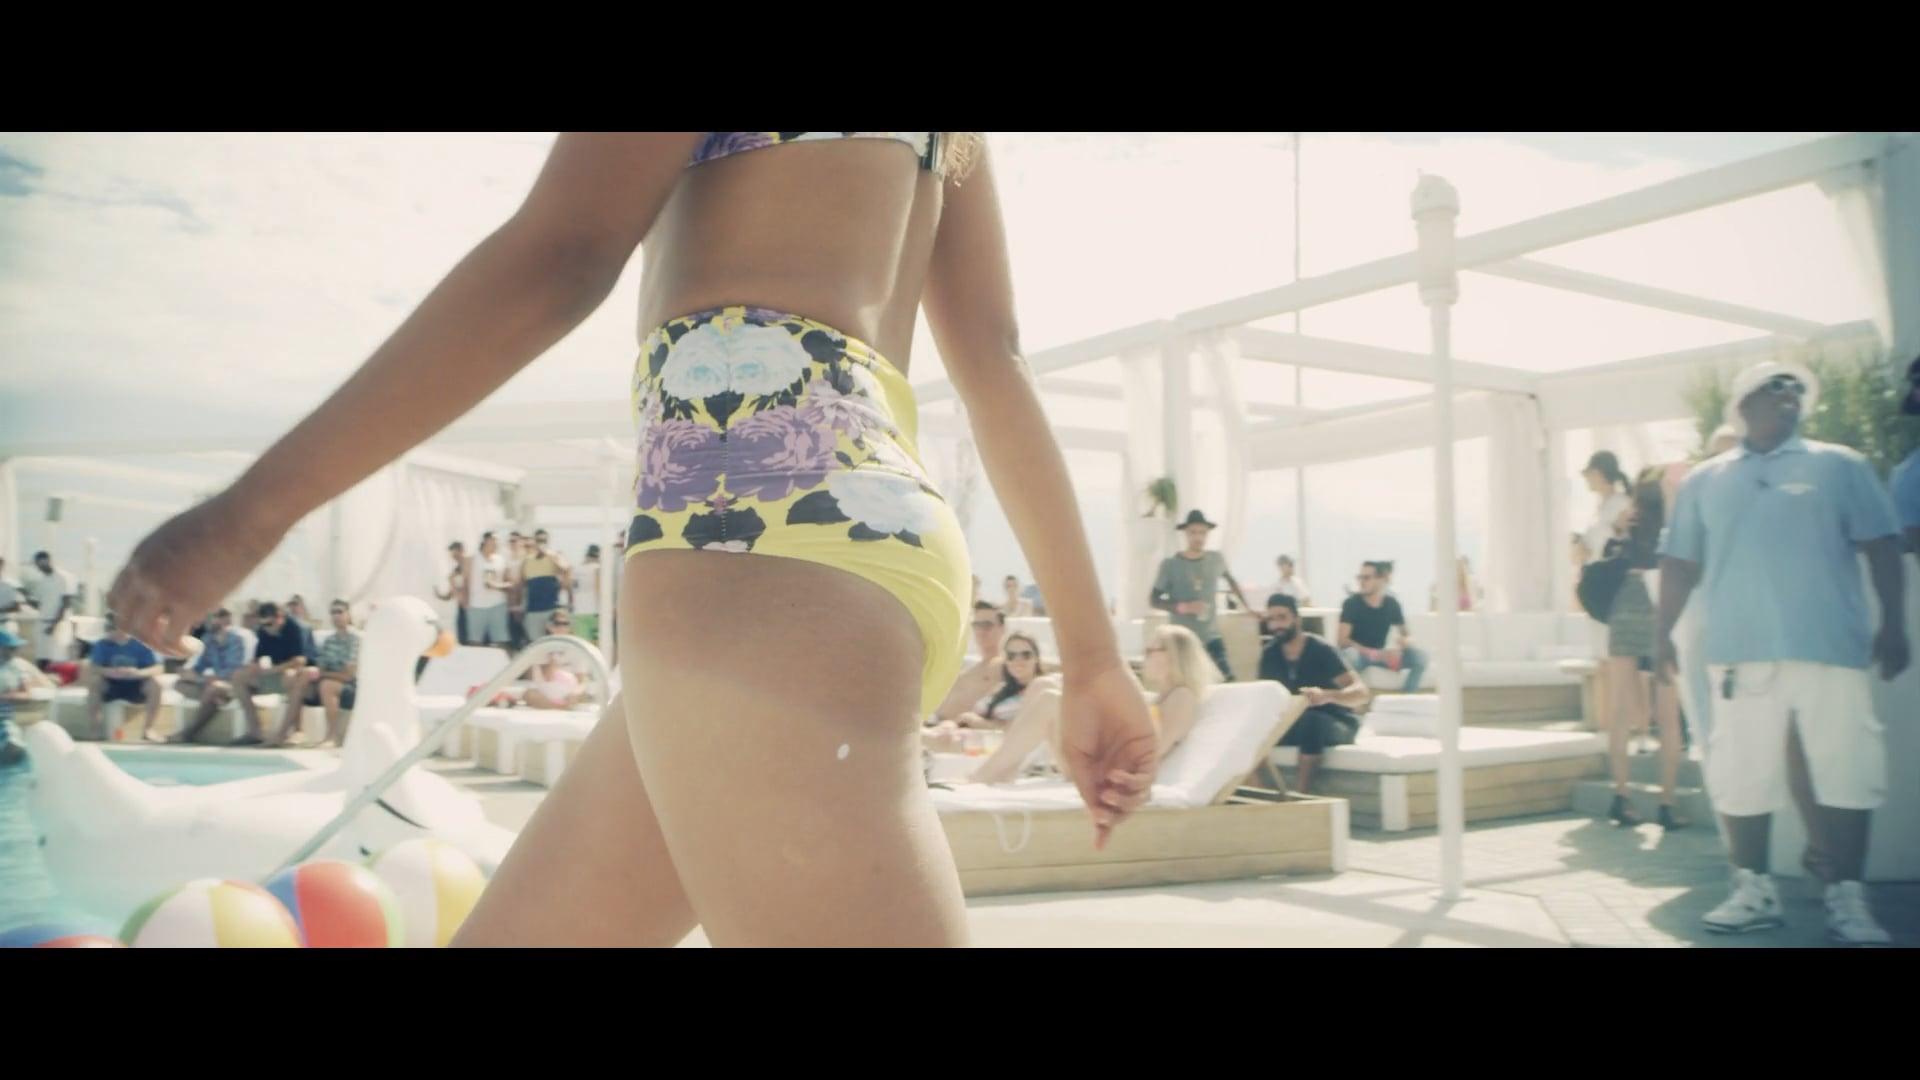 Cabana Pool Bar - Fitness Fashion Show